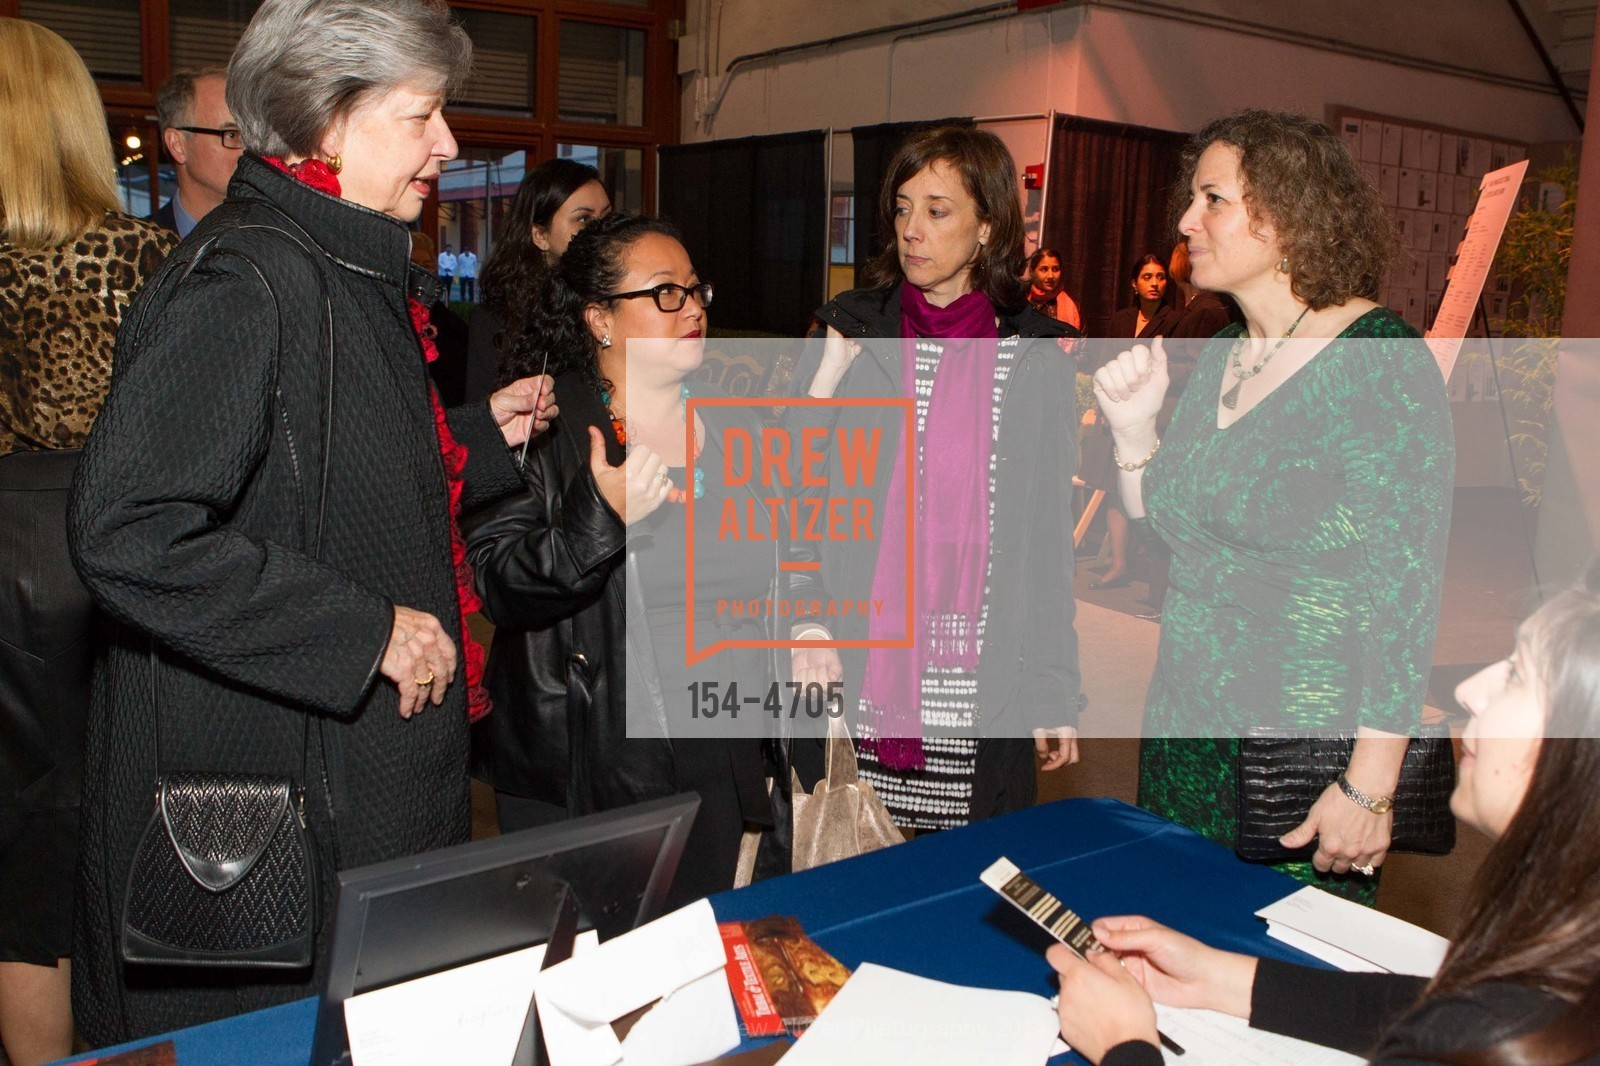 Louise Mackie, Sofia Sanabrais. Sarah Fee, Christina Hellmich, Photo #154-4705